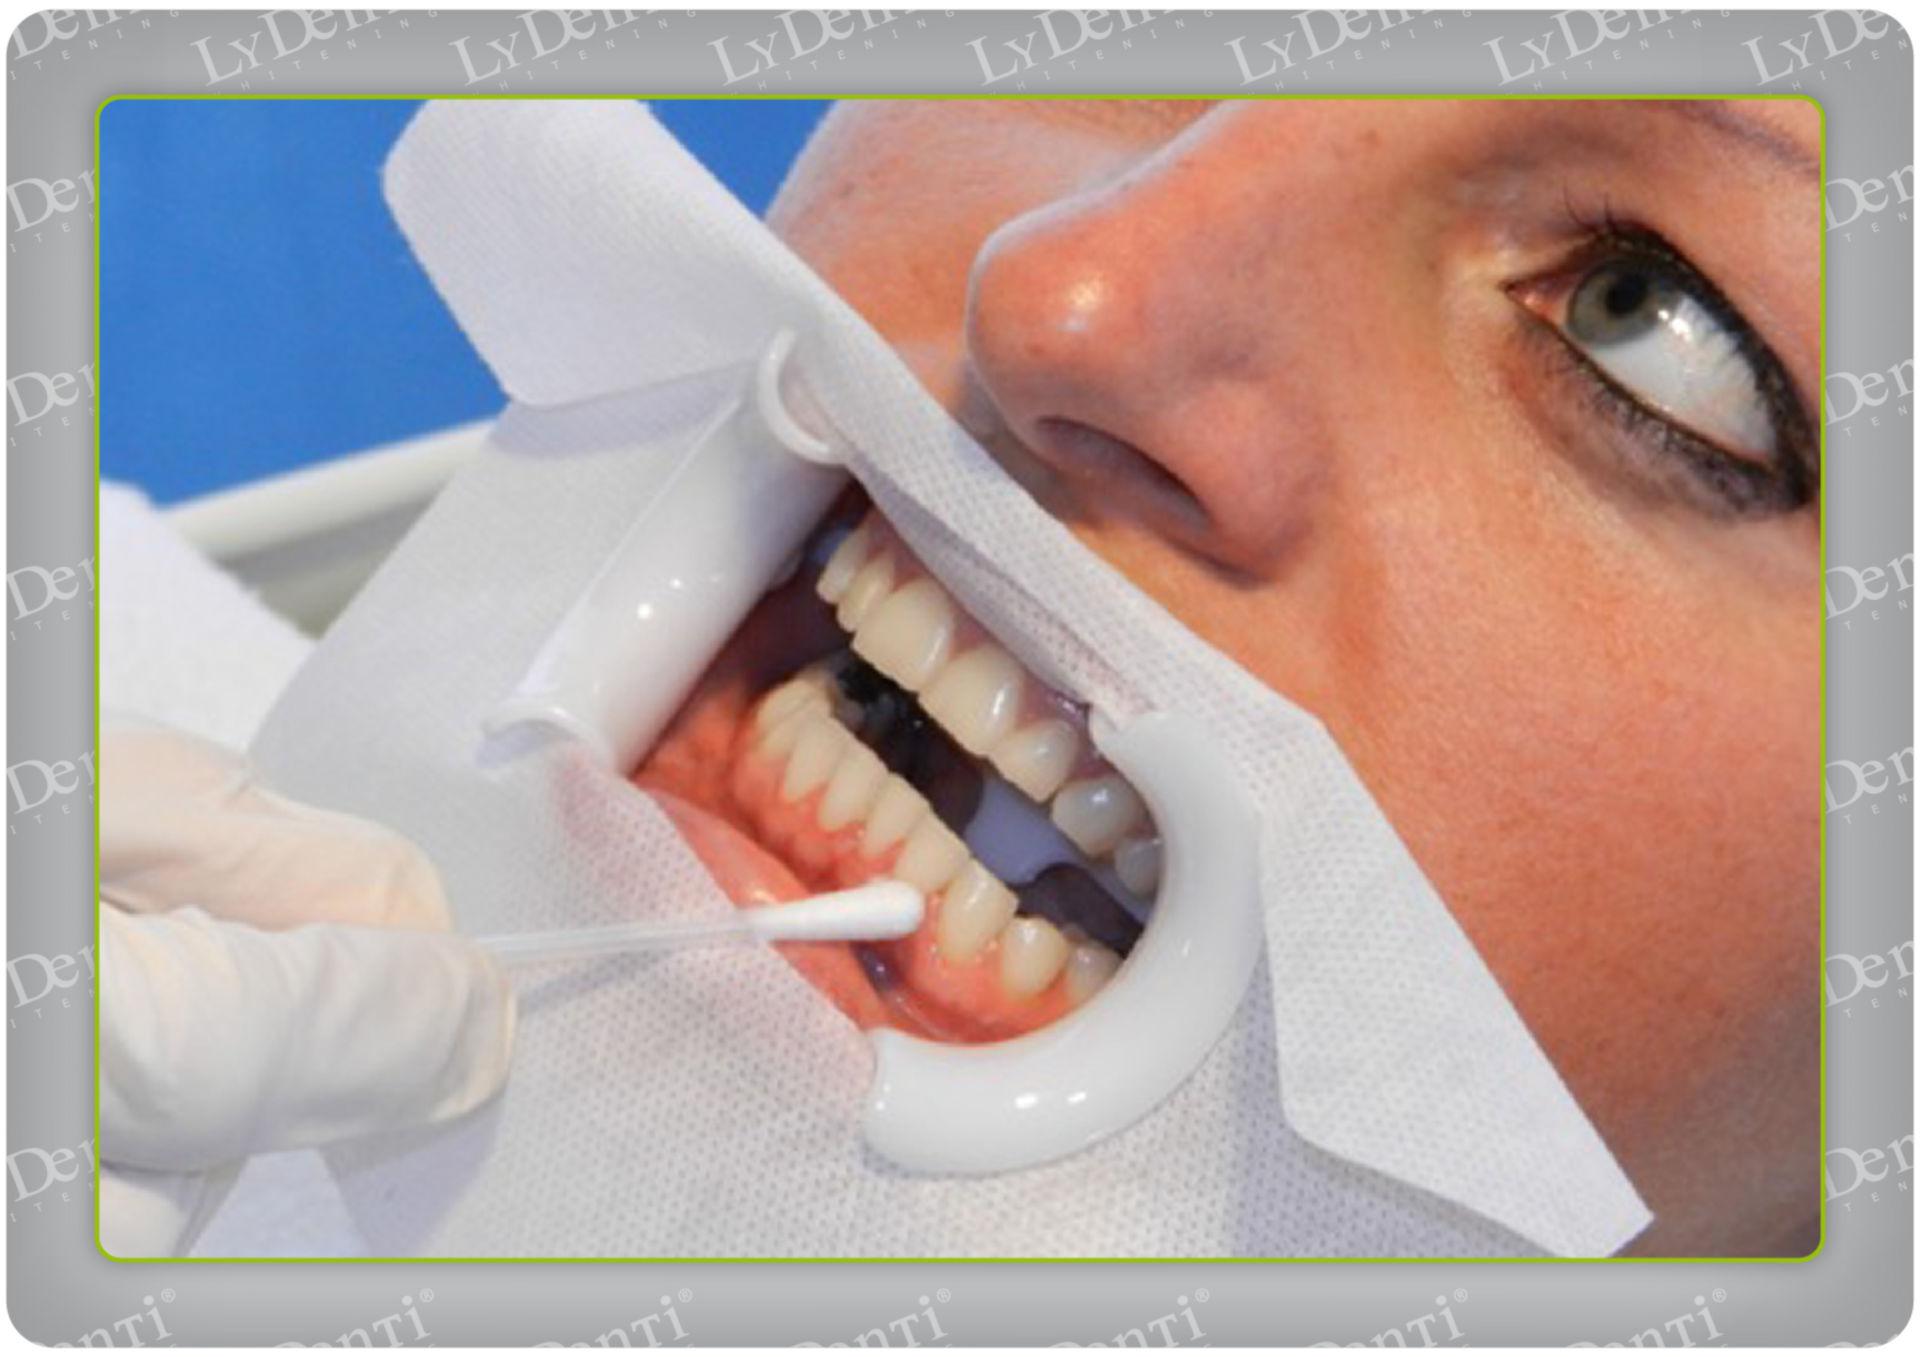 Blanqueamiento dental (11)